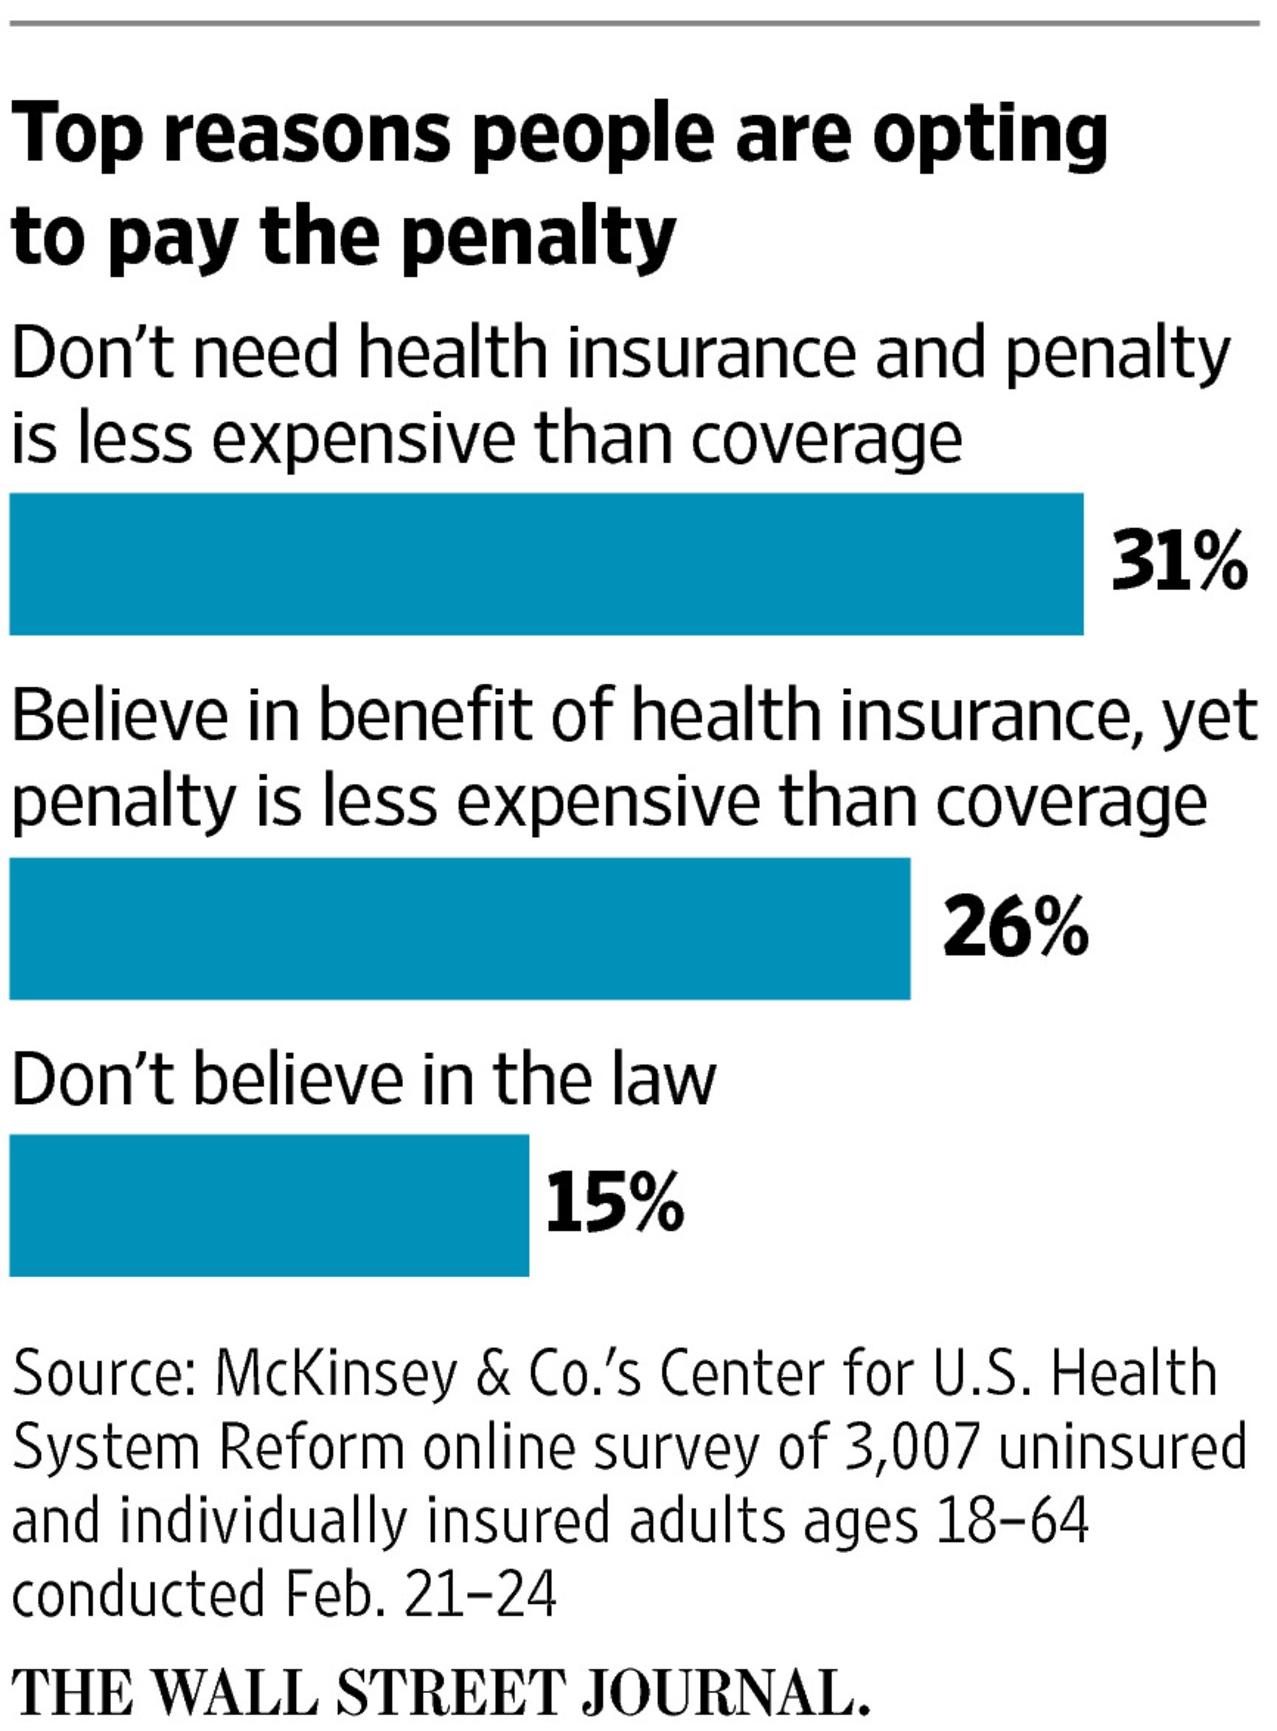 Wall Street Journal on Uninsured